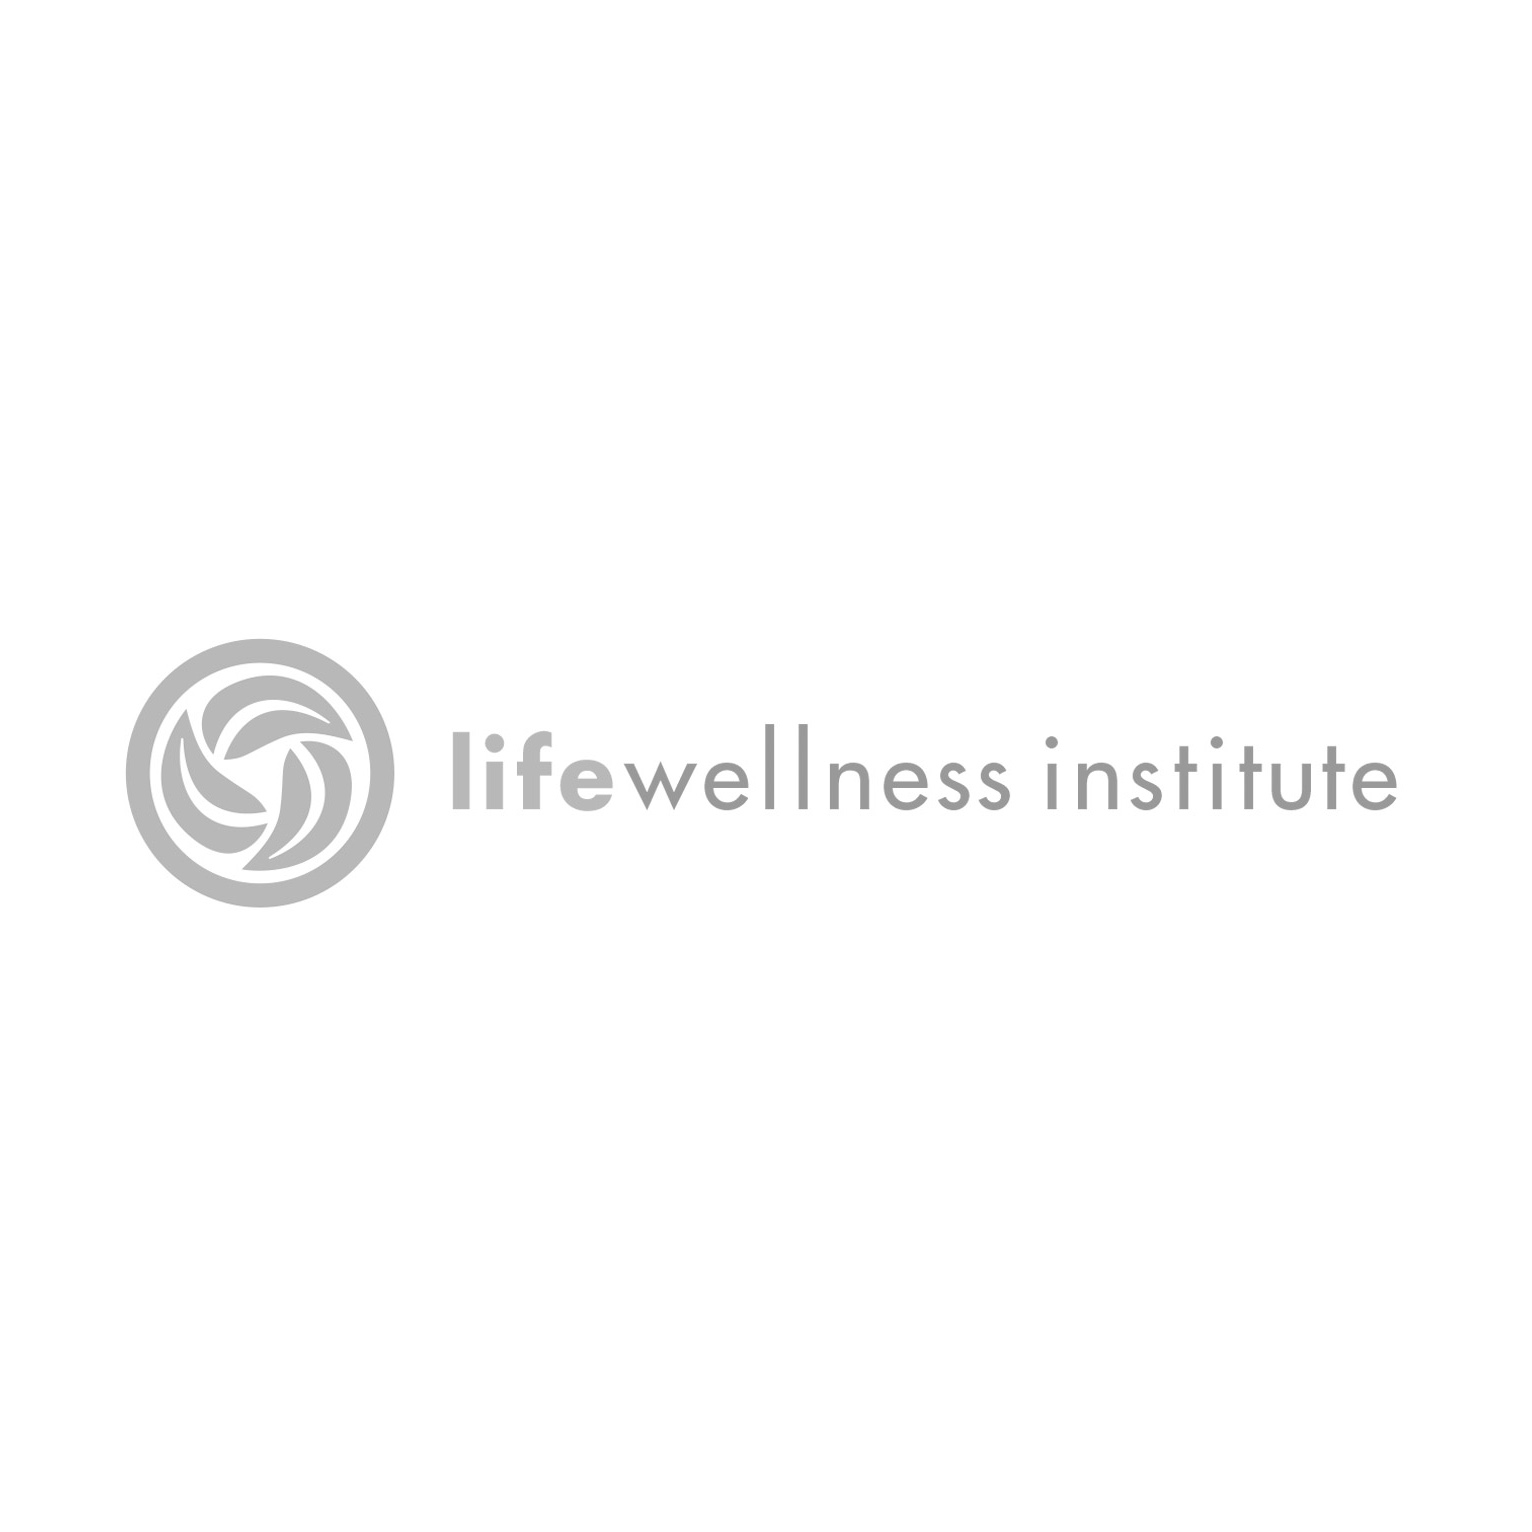 img_partner_logo_lifewellness_square.jpg